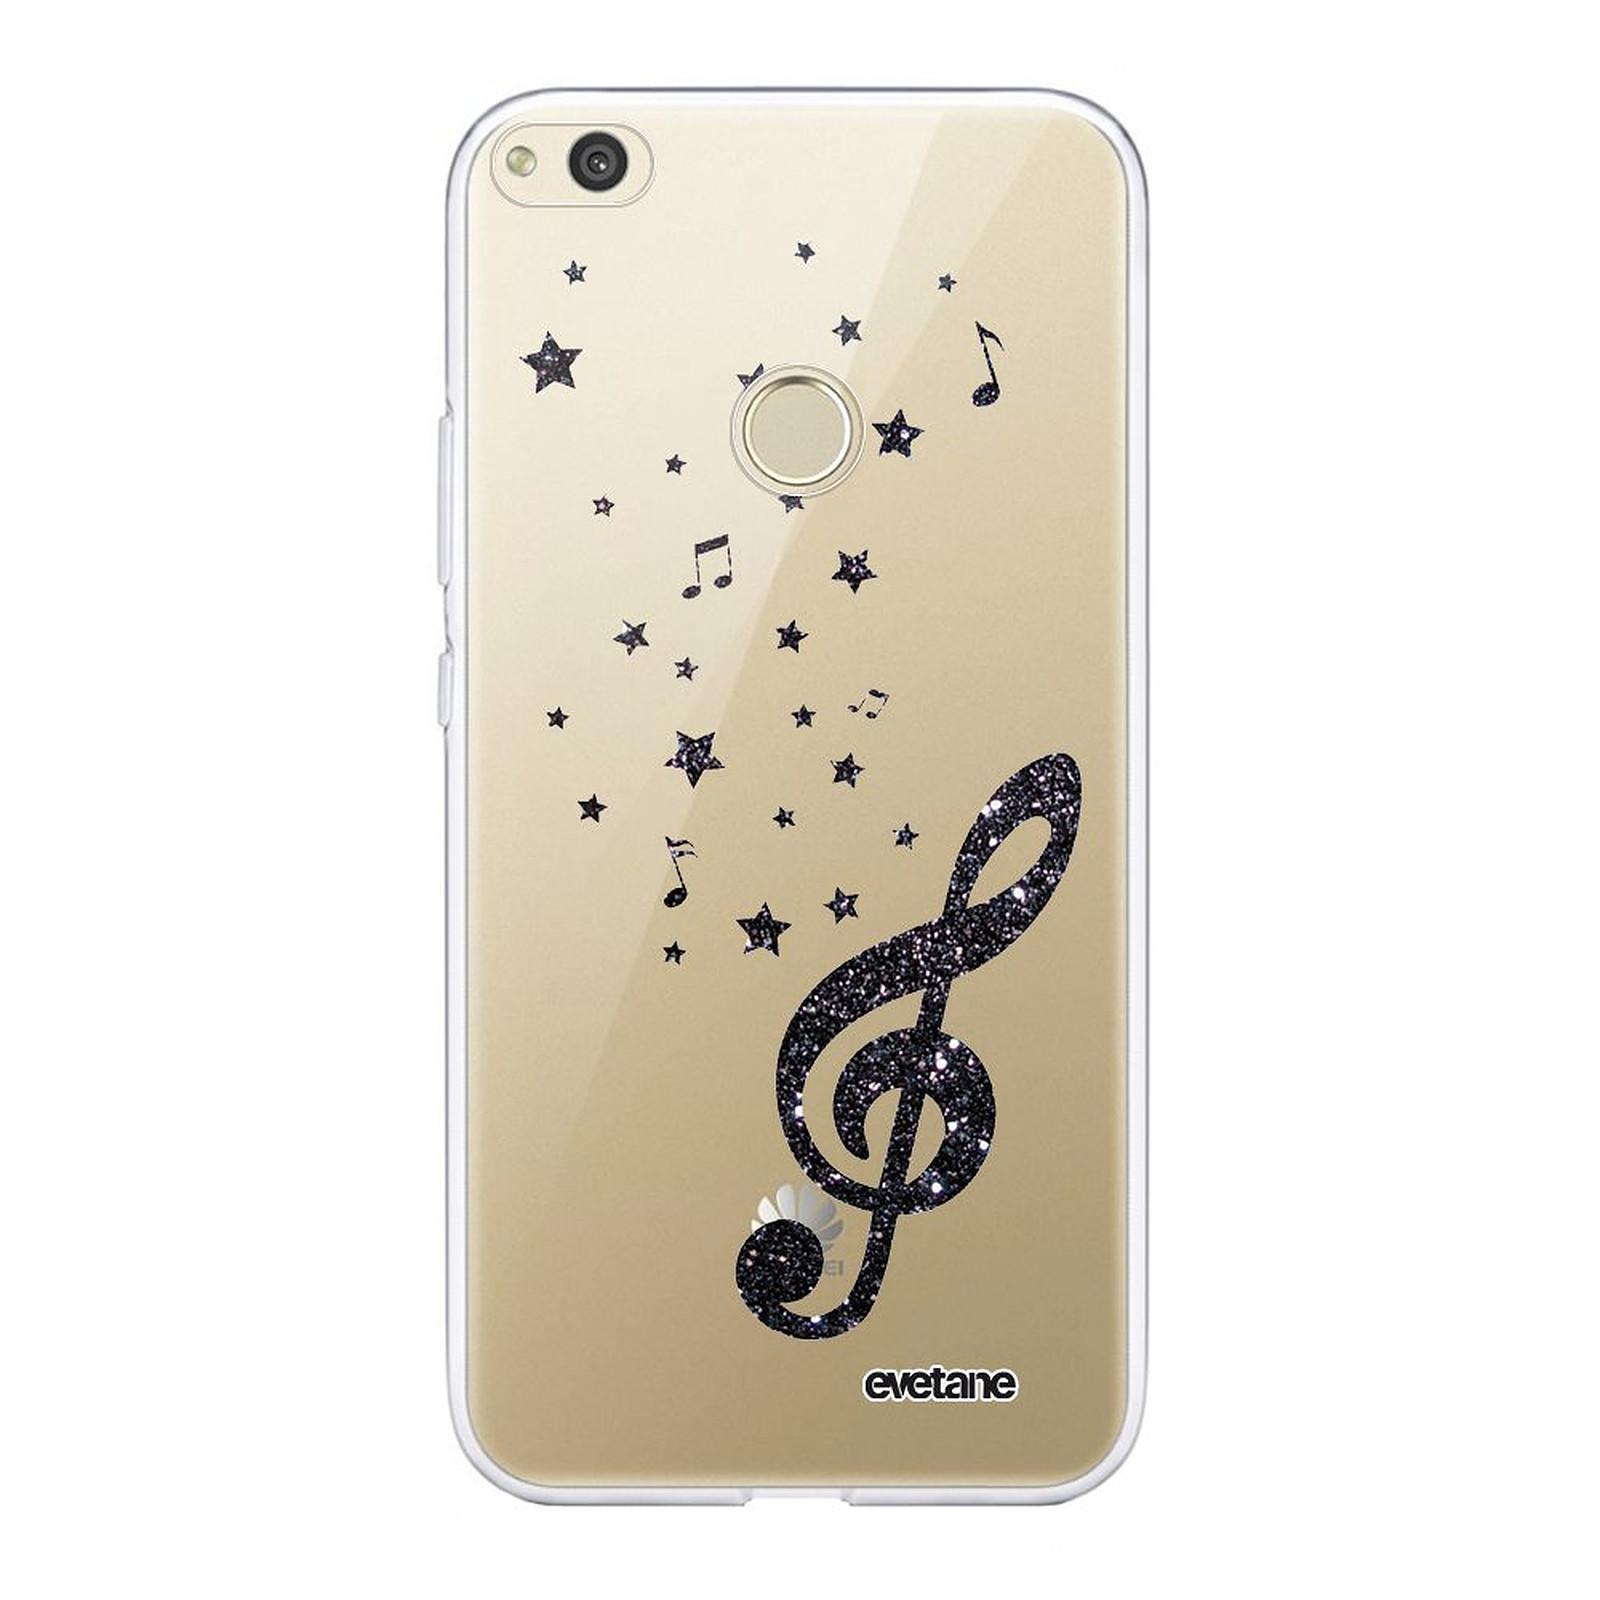 EVETANE Coque Huawei P8 lite 2017 souple transparente Note de Musique - Coque téléphone Evetane sur LDLC